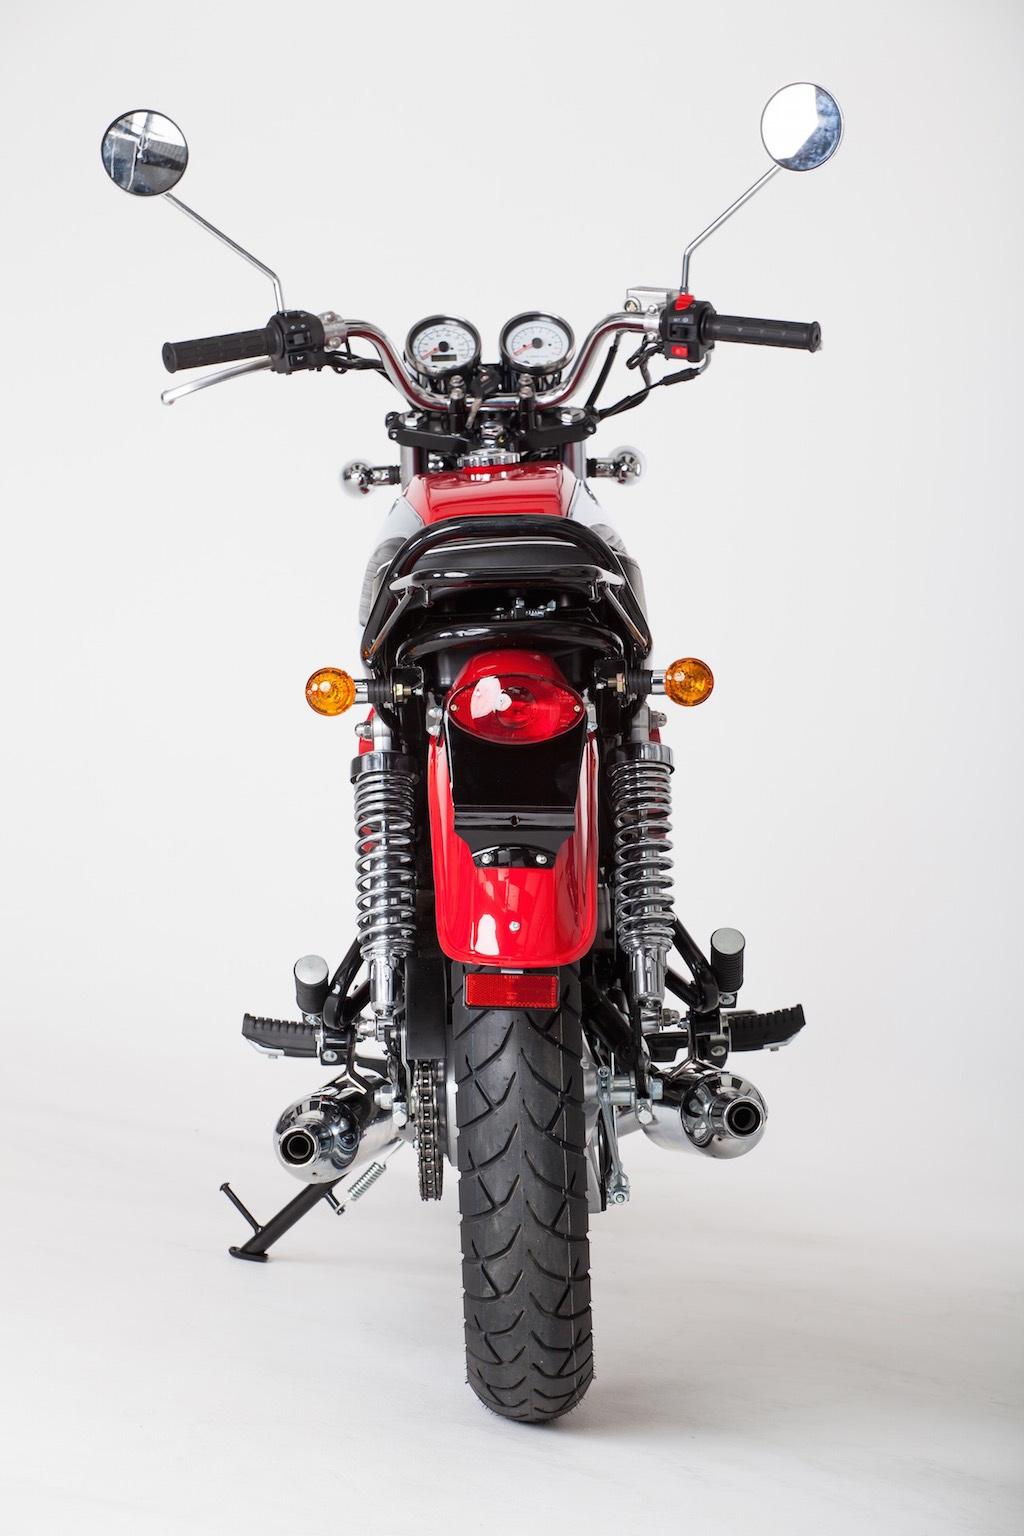 2017 Jawa 350 OHC rear